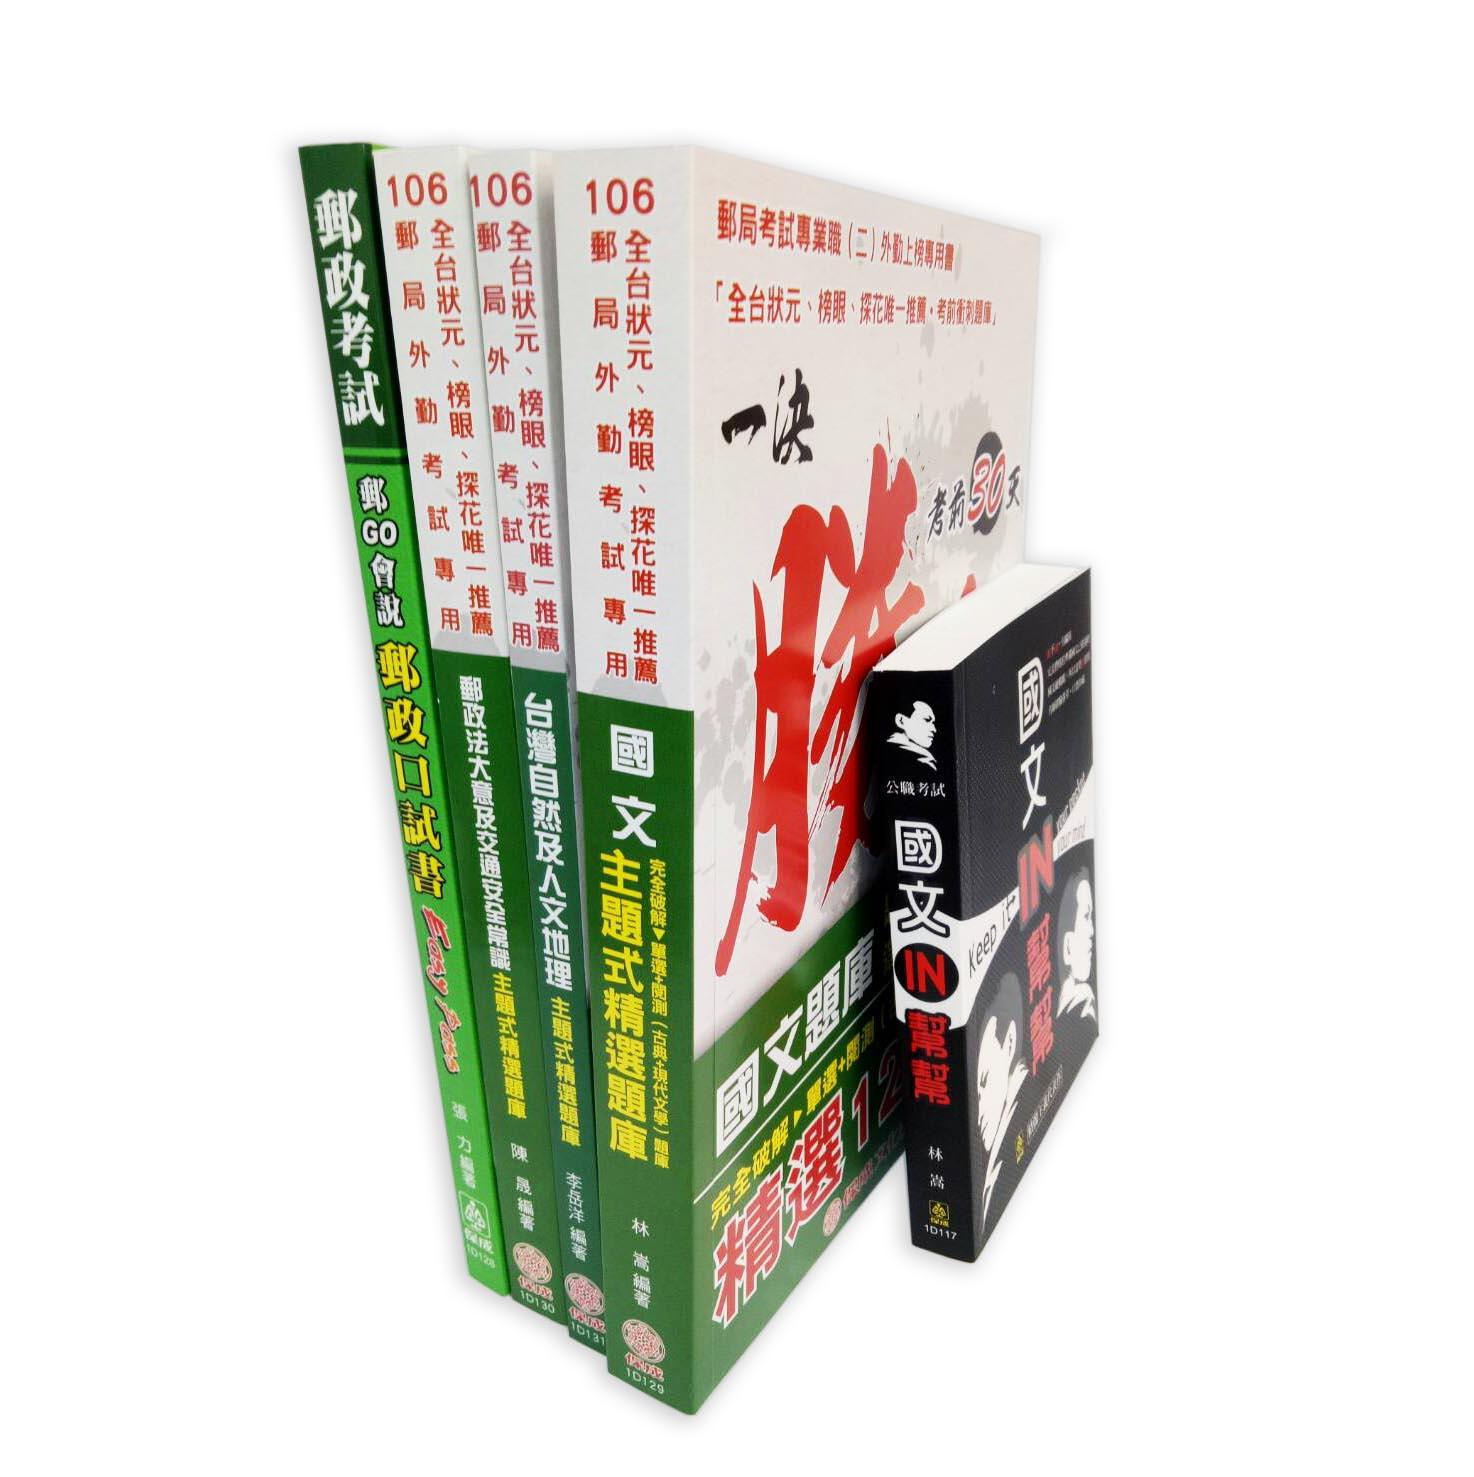 1D1P2-106邮局外勤题库套书(共5本)(套书明细:1D129、1D130、1D131、1D117、1D128)